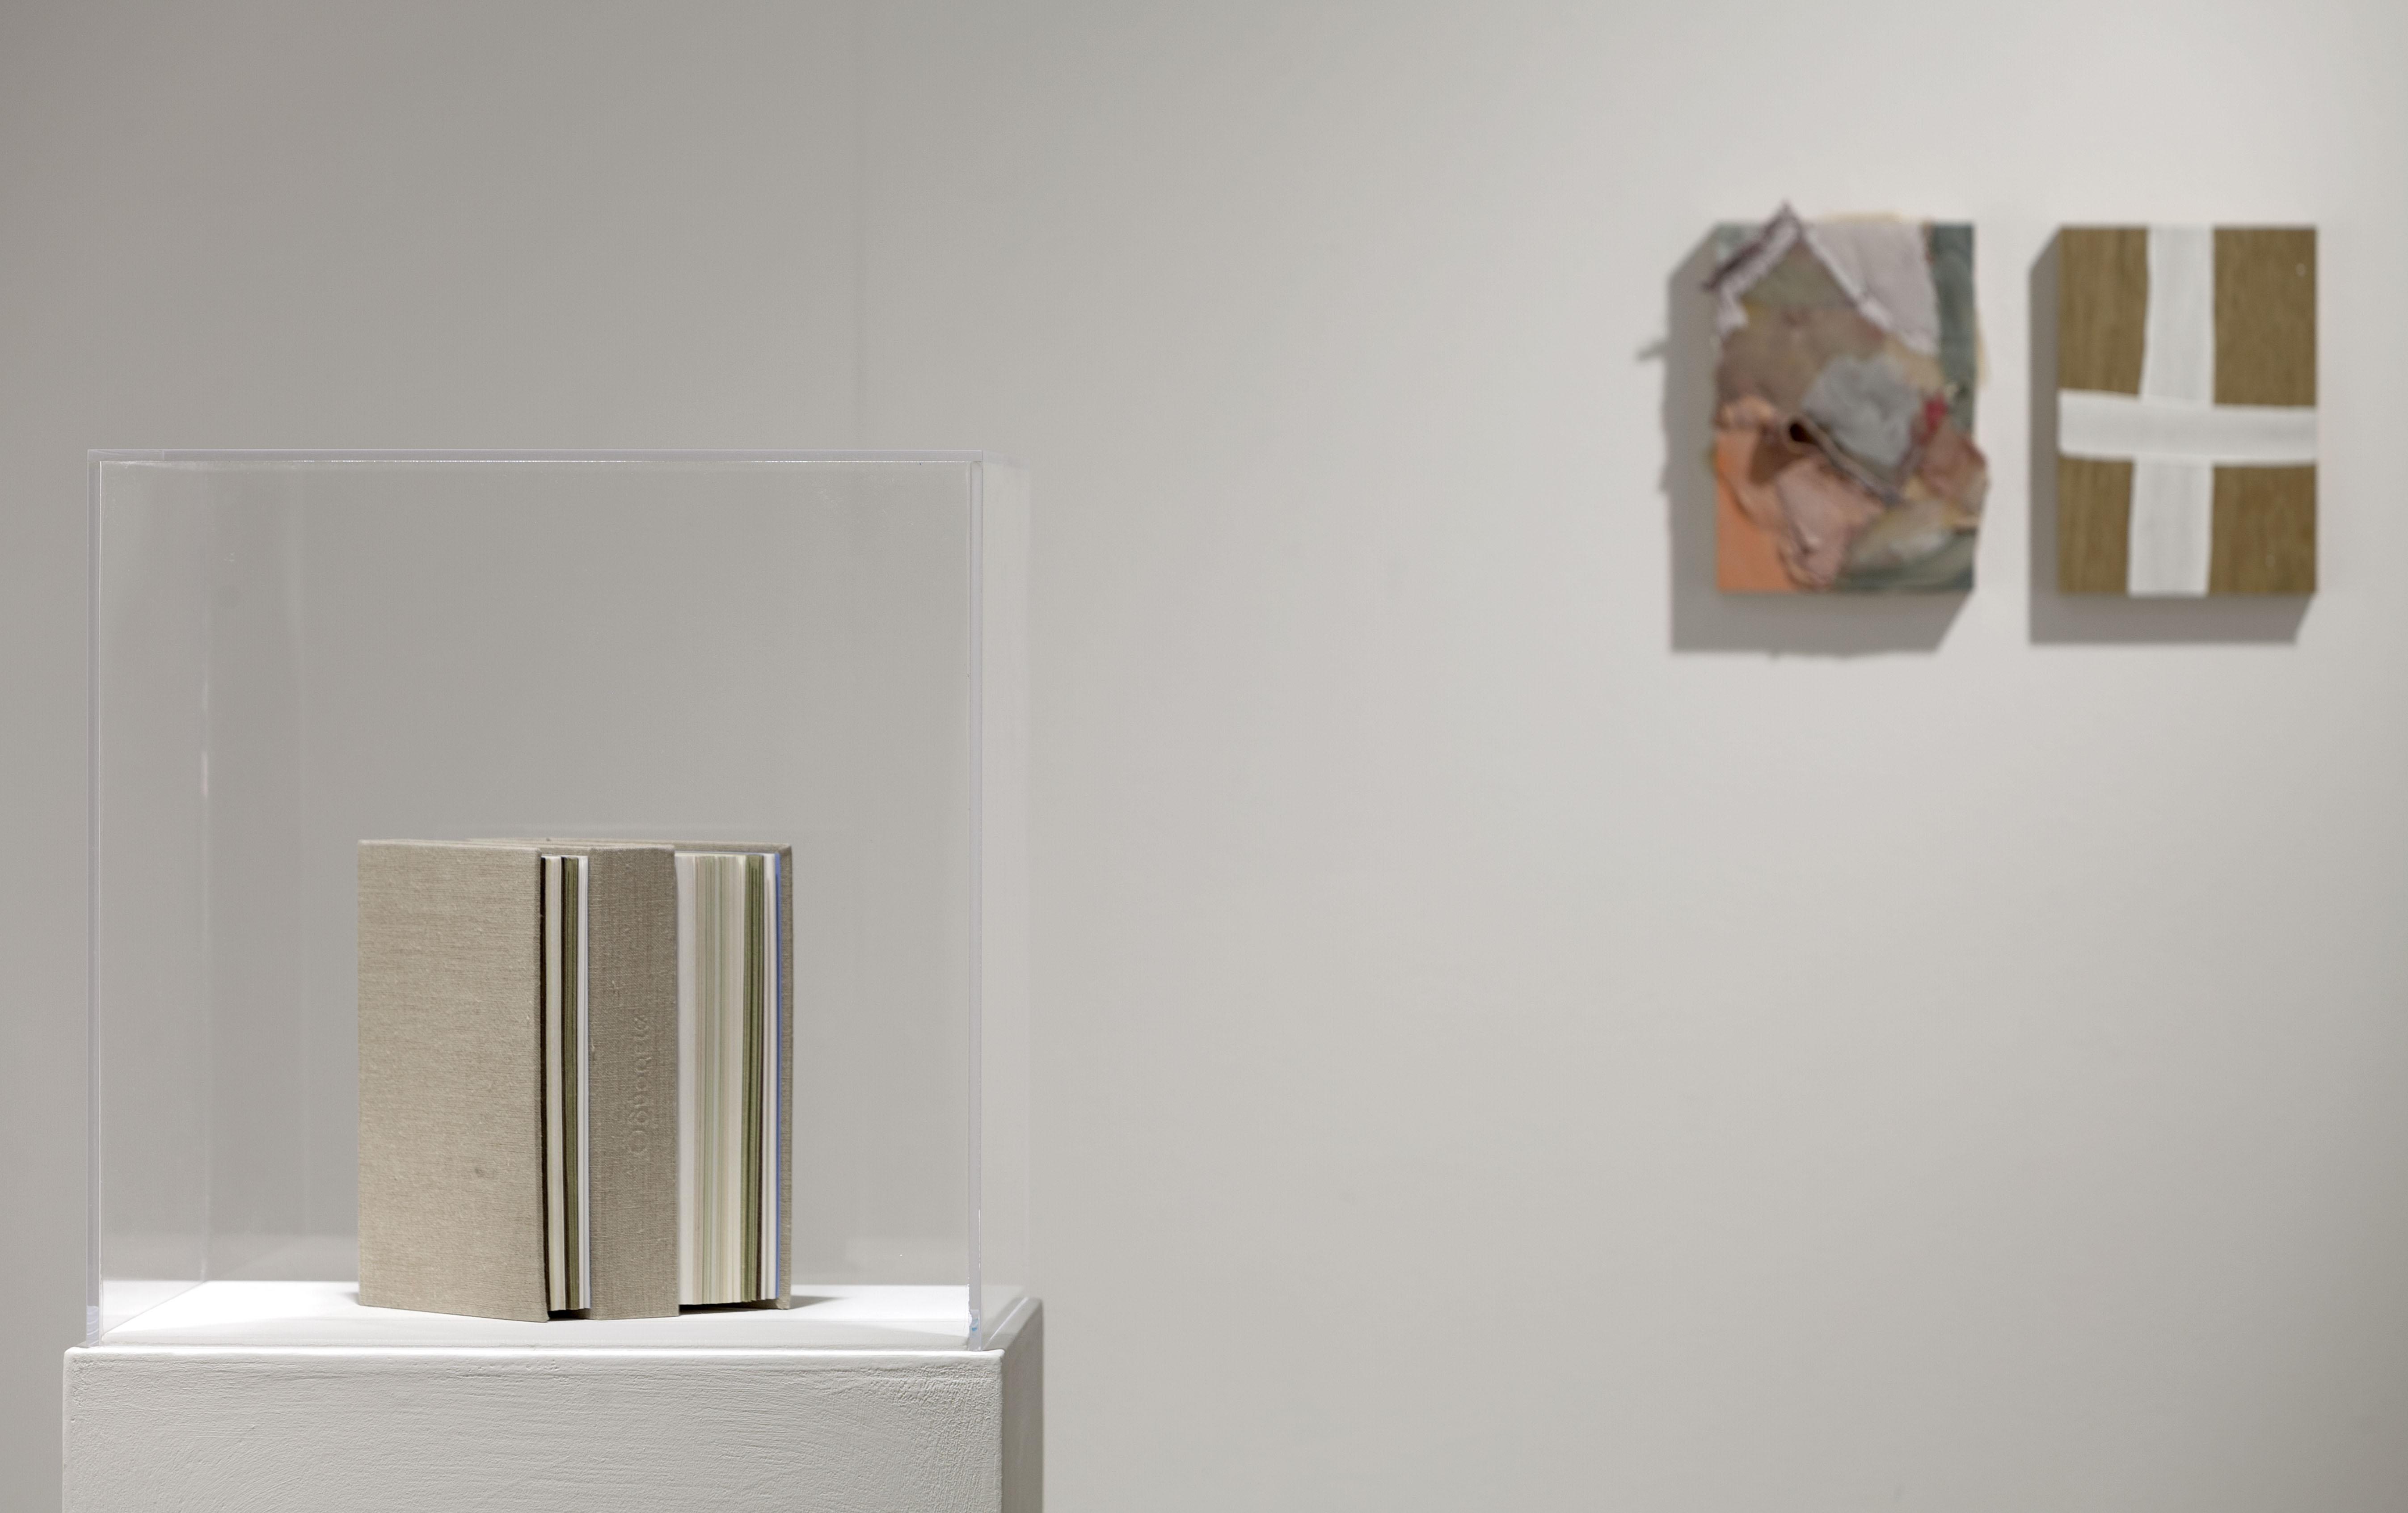 Installation view, Marignana Arte, Hotel nostos. Humble, nimble, dreamlike tumble, Sofia Stevi, Odissey, Diary series